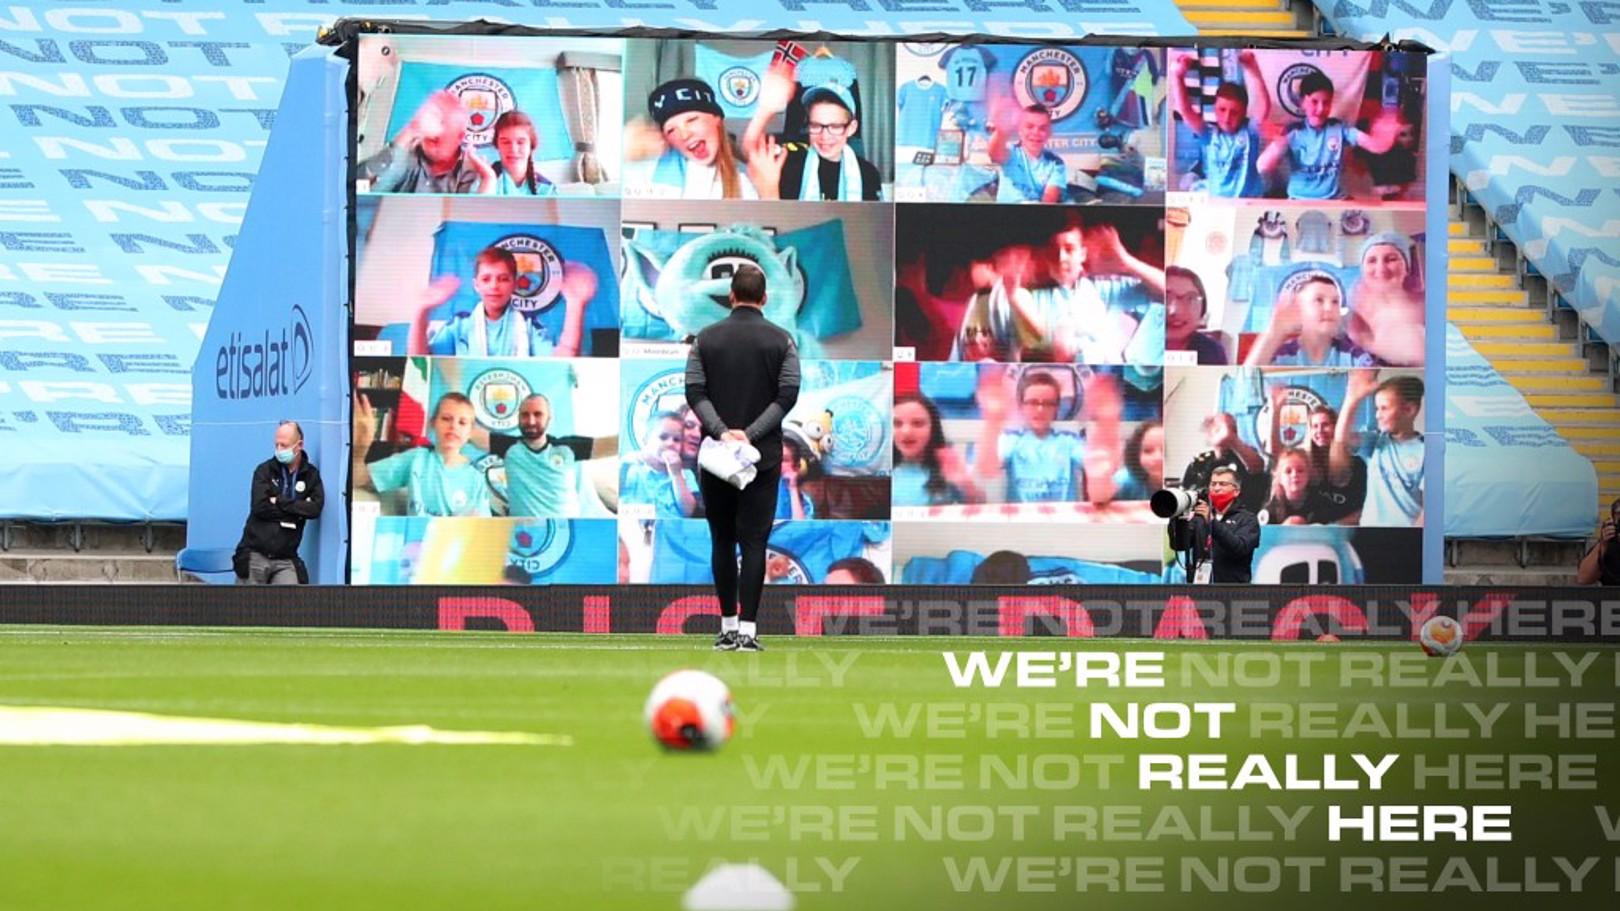 Competition winners take over Etihad Stadium fan wall